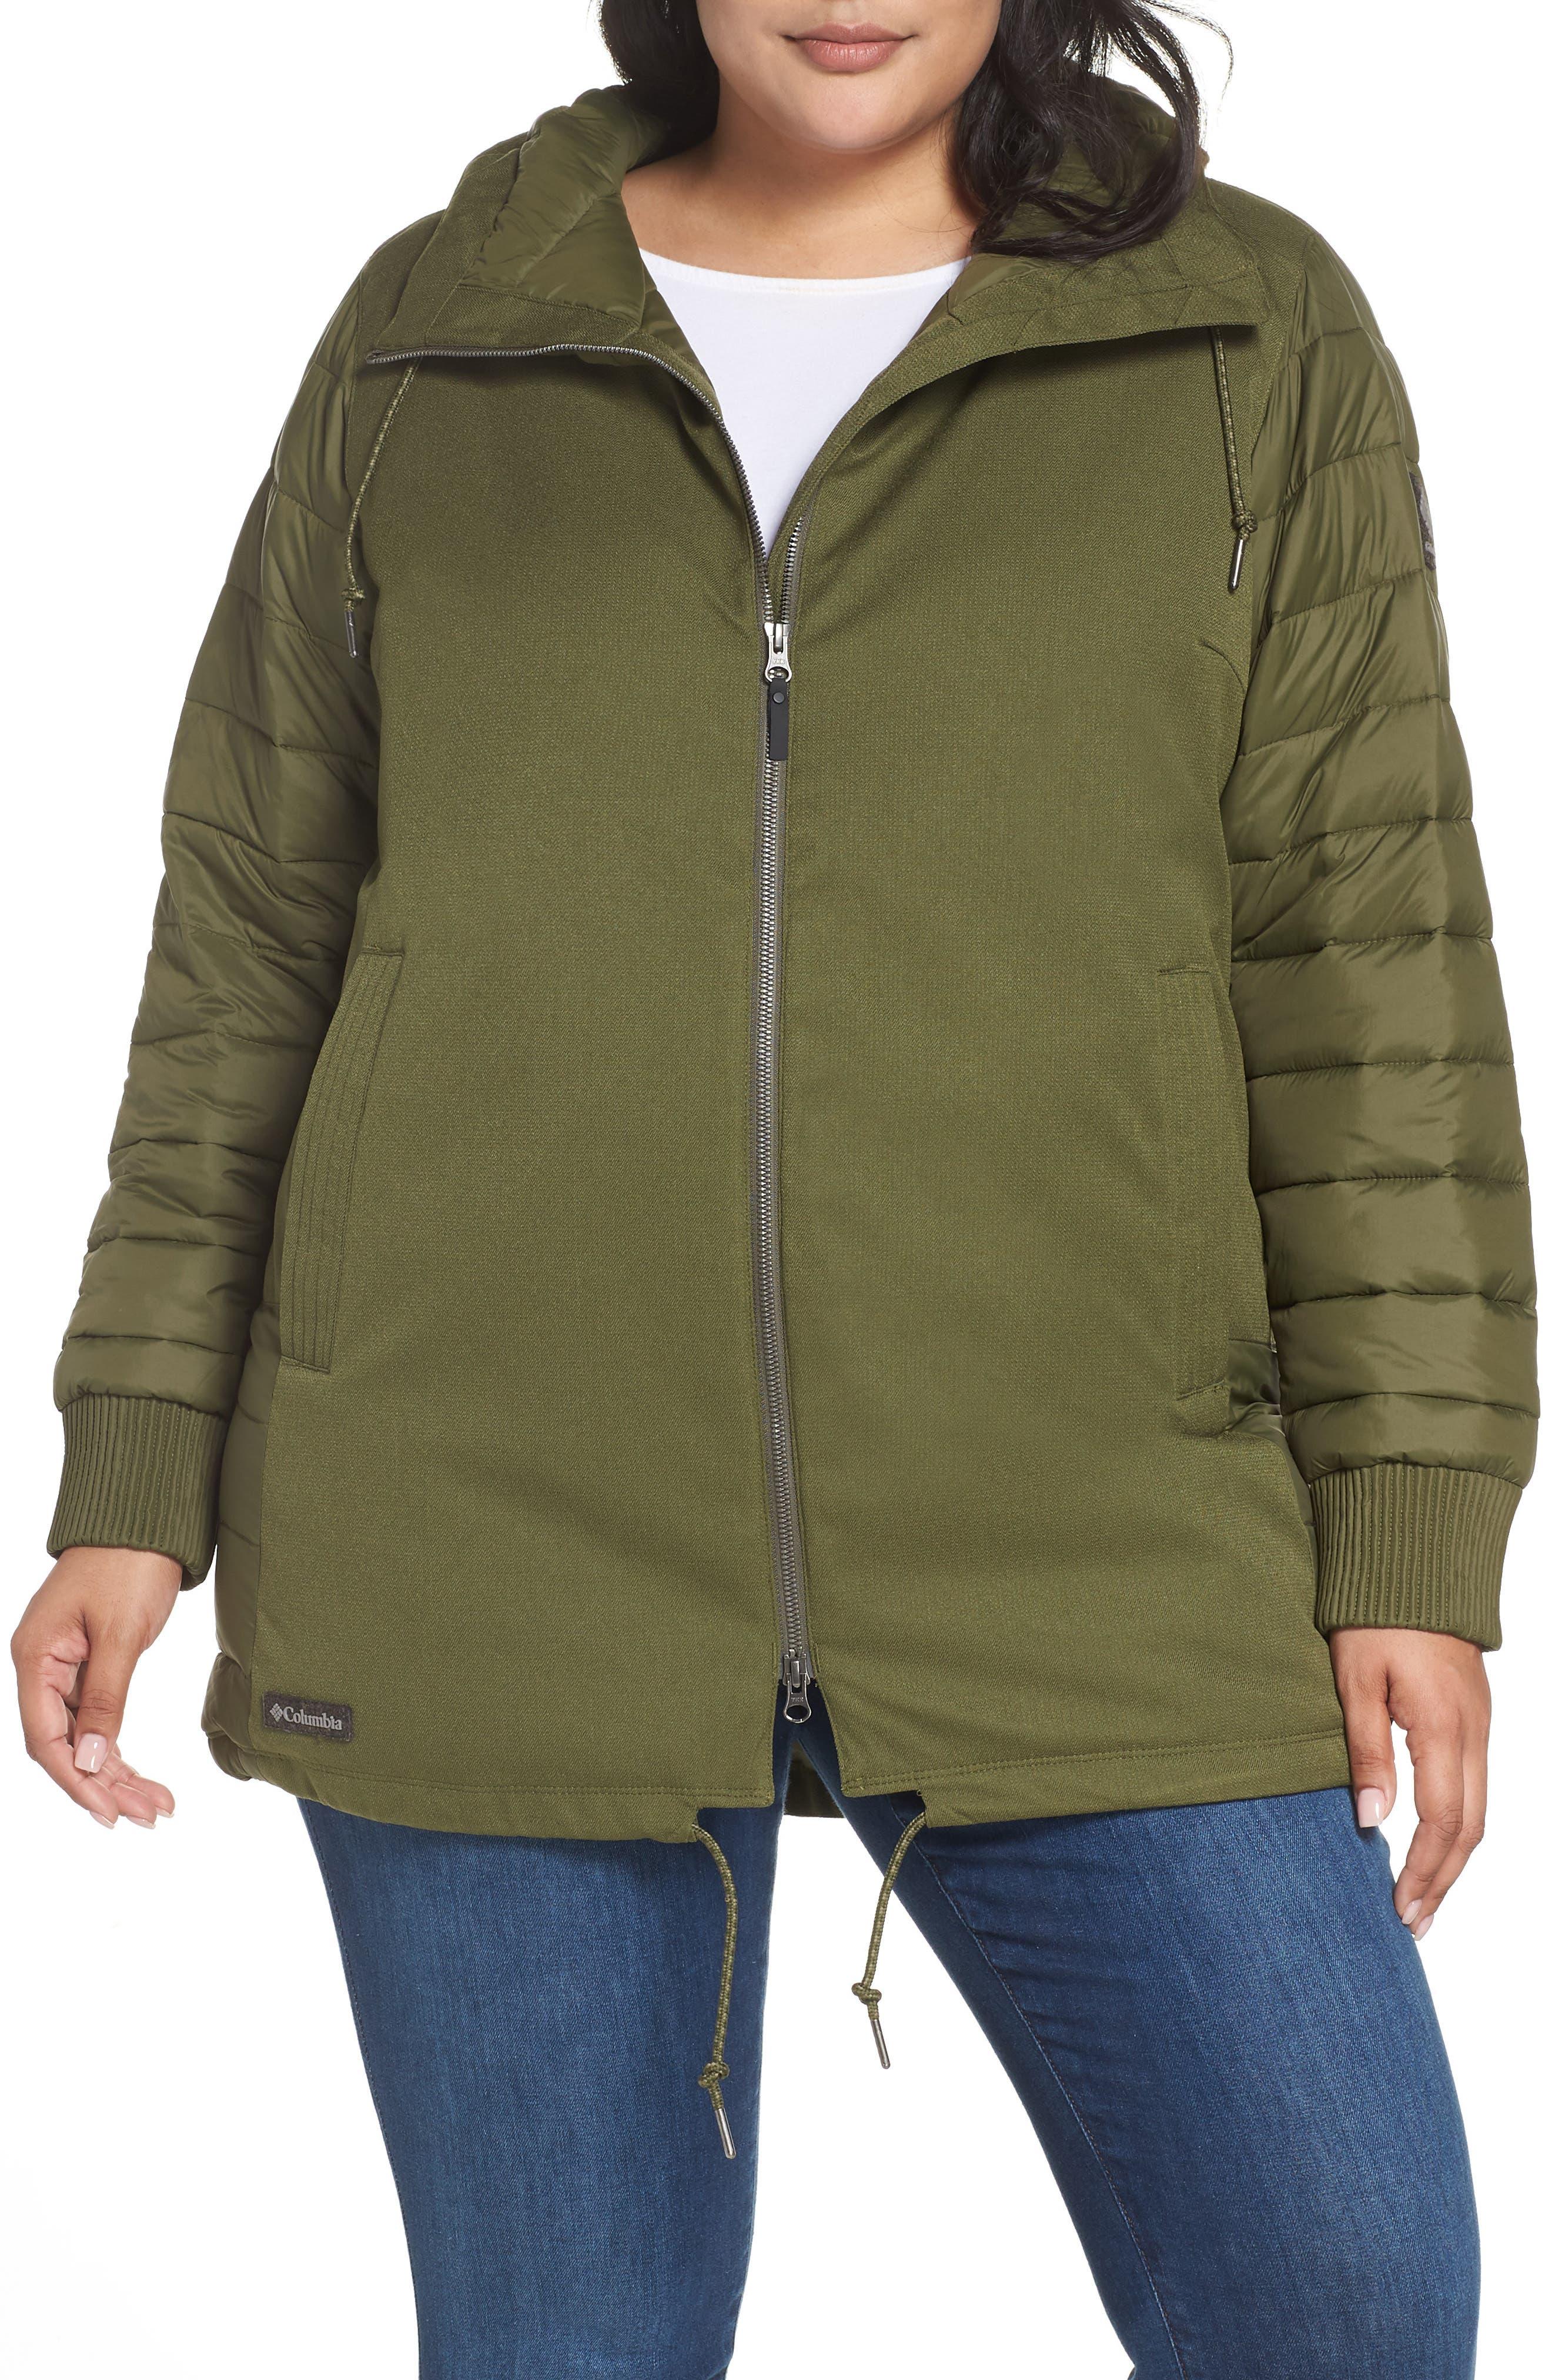 Boundary Bay Waterproof Hybrid Jacket,                             Main thumbnail 1, color,                             383